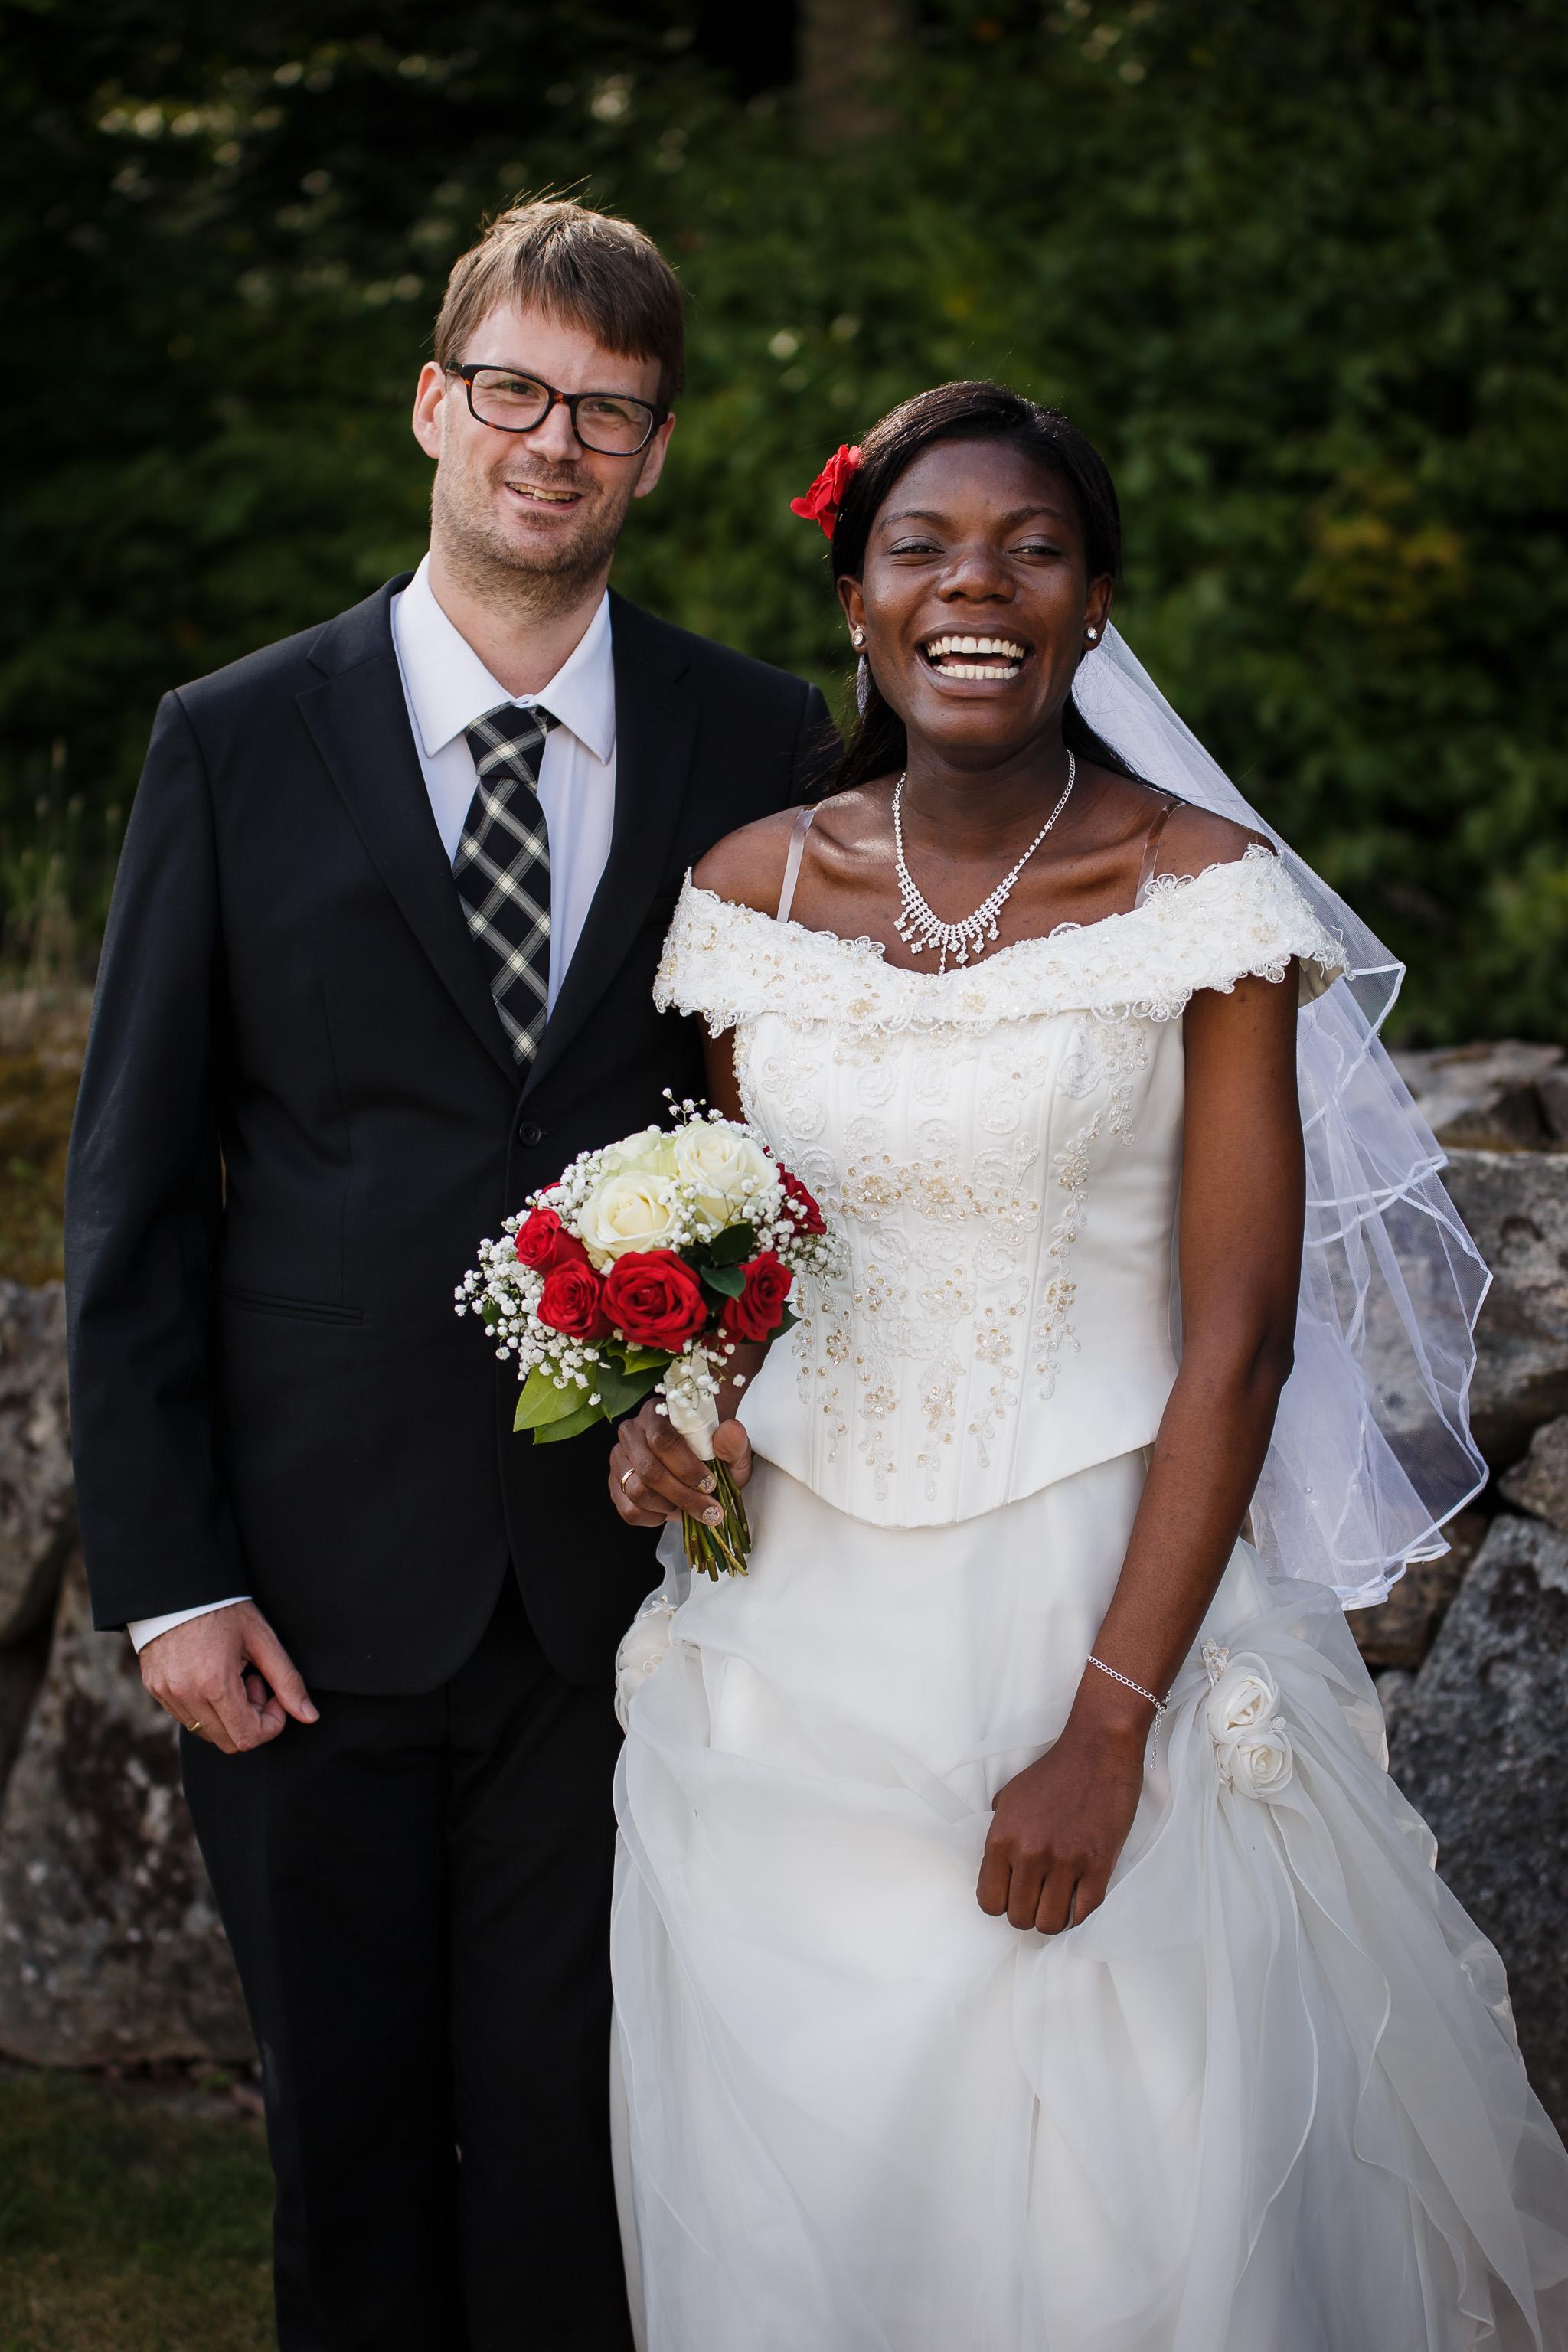 2014-08-16-bryllup-prisca-mathias-0410-fb.jpg